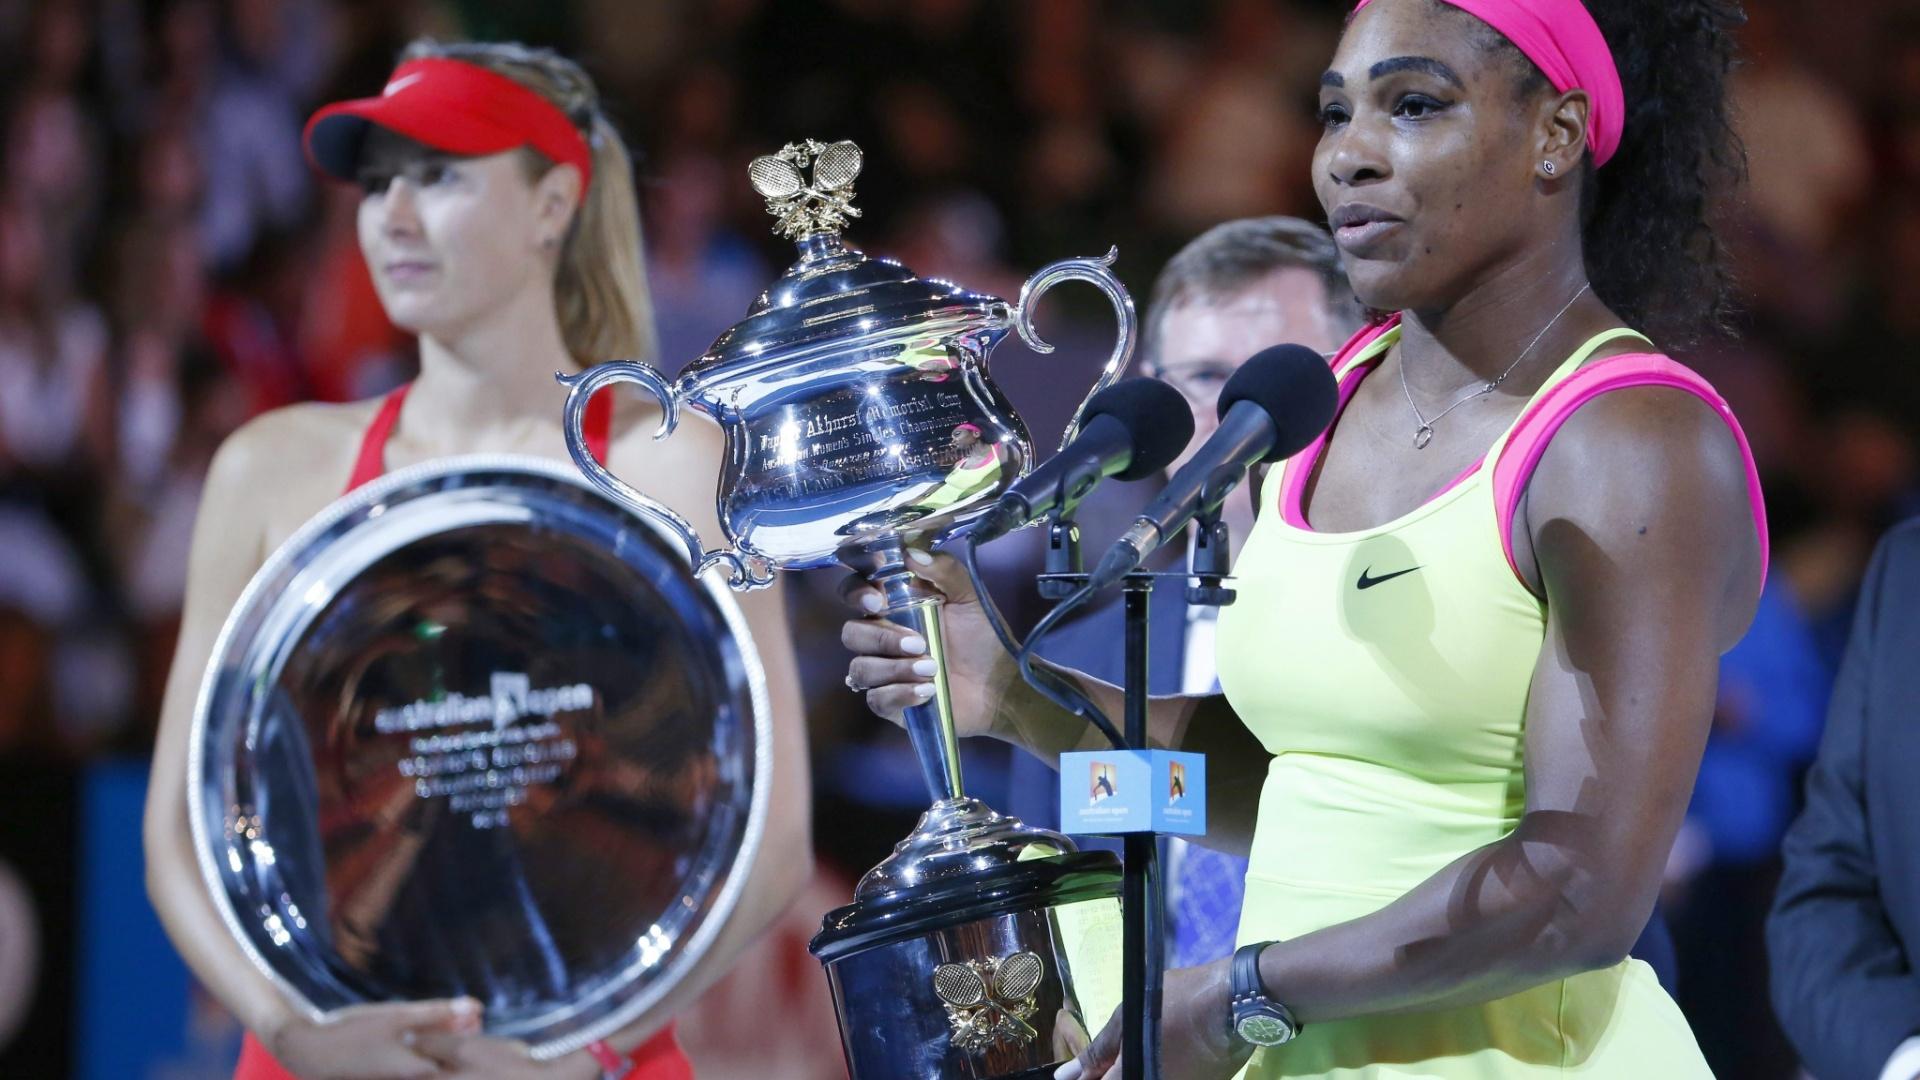 Serena faz discurso de agradecimento observada por Sharapova